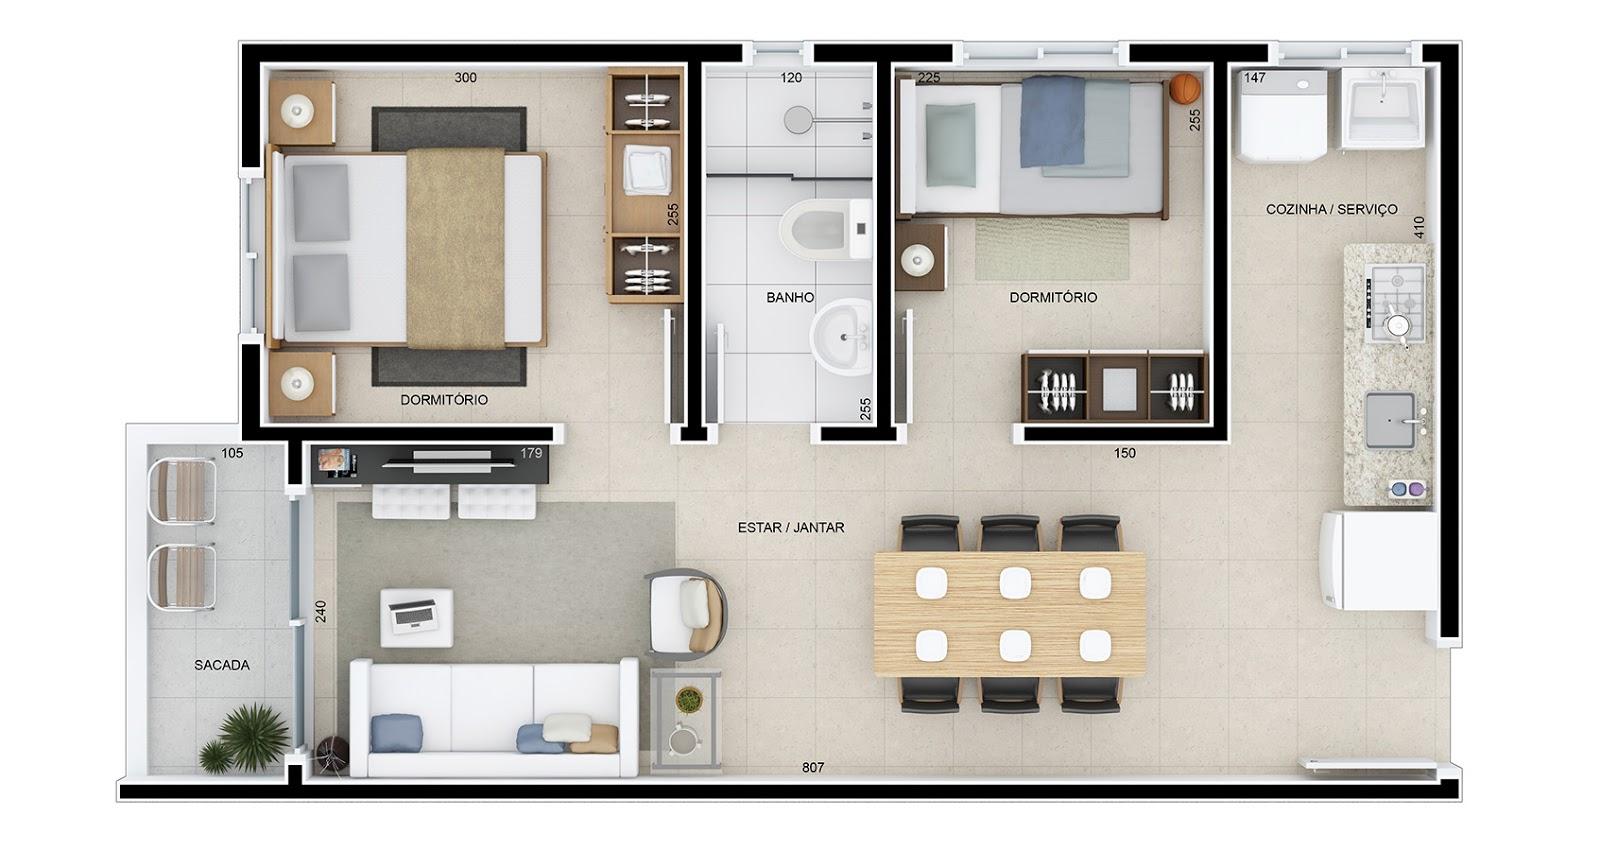 Modelo De Casa 2 Dormit Rios Minha Casa Minha Vida